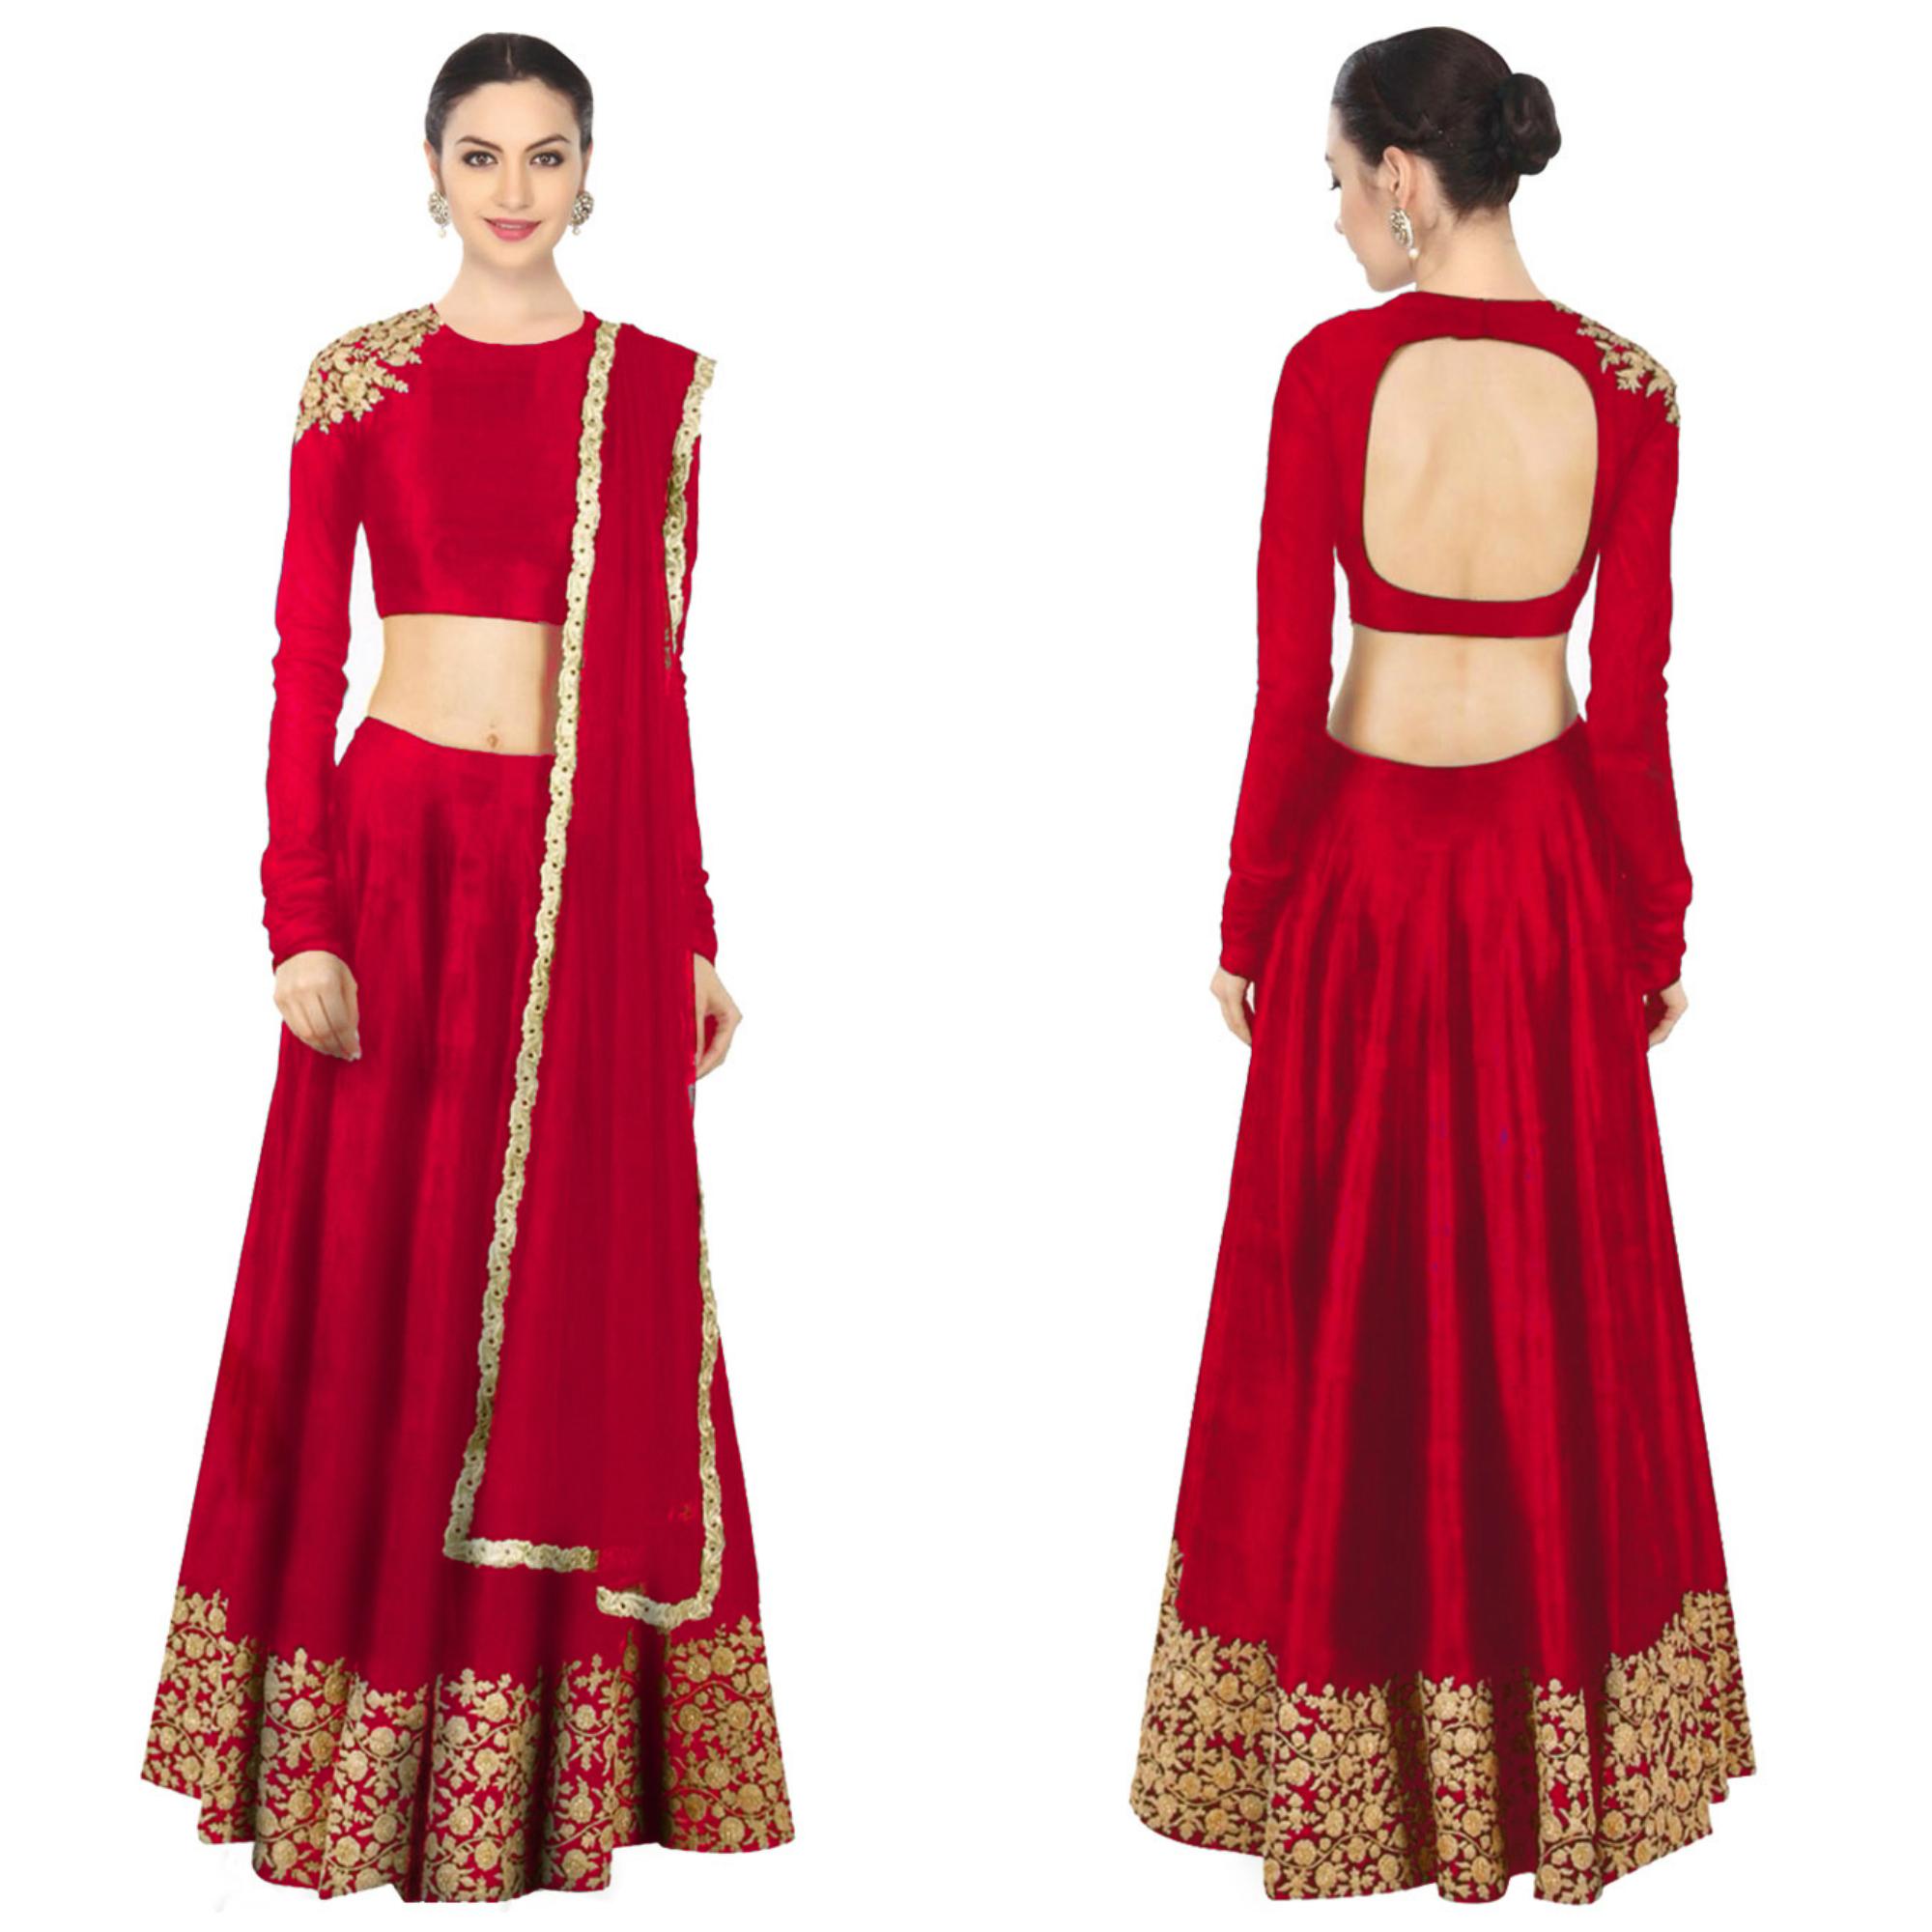 daedb14141296 Rozy Fashion red embroidered raw silk semi stitched lehenga choli material  with matching net dupatta - Rozy Fashion - 1757115